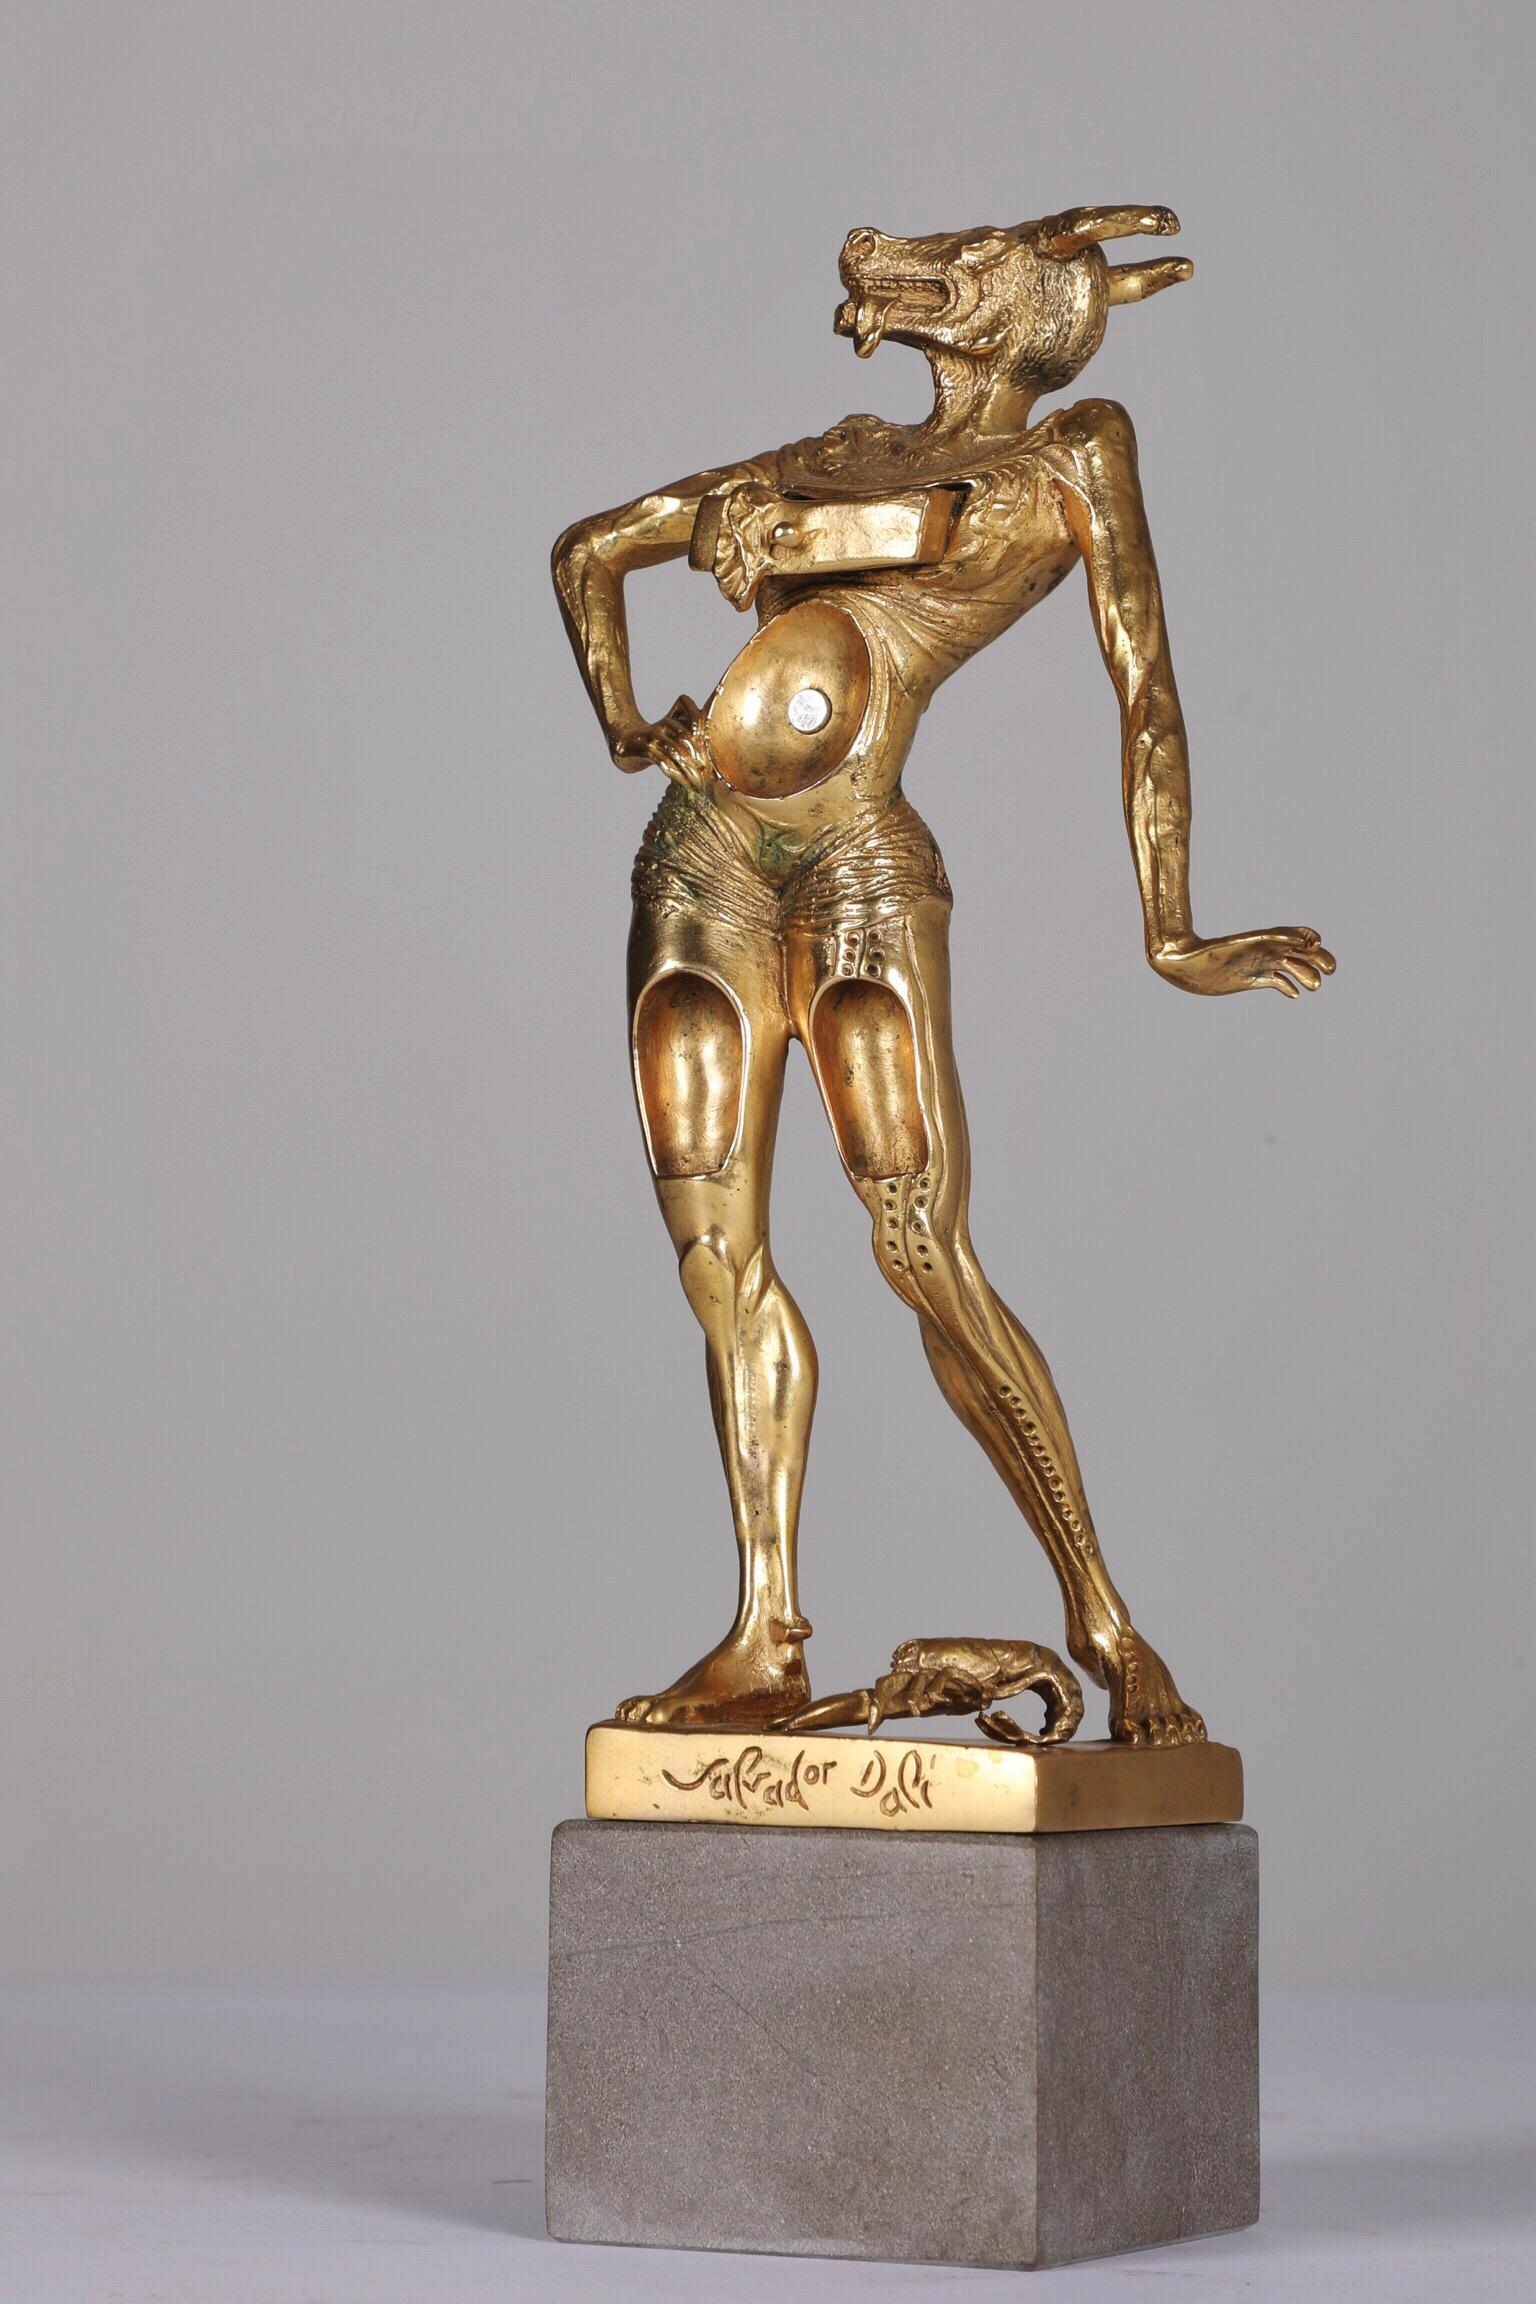 Petit Minotaure - 1981Bronze and gold leaf 22 carats10/350H: 19 cm